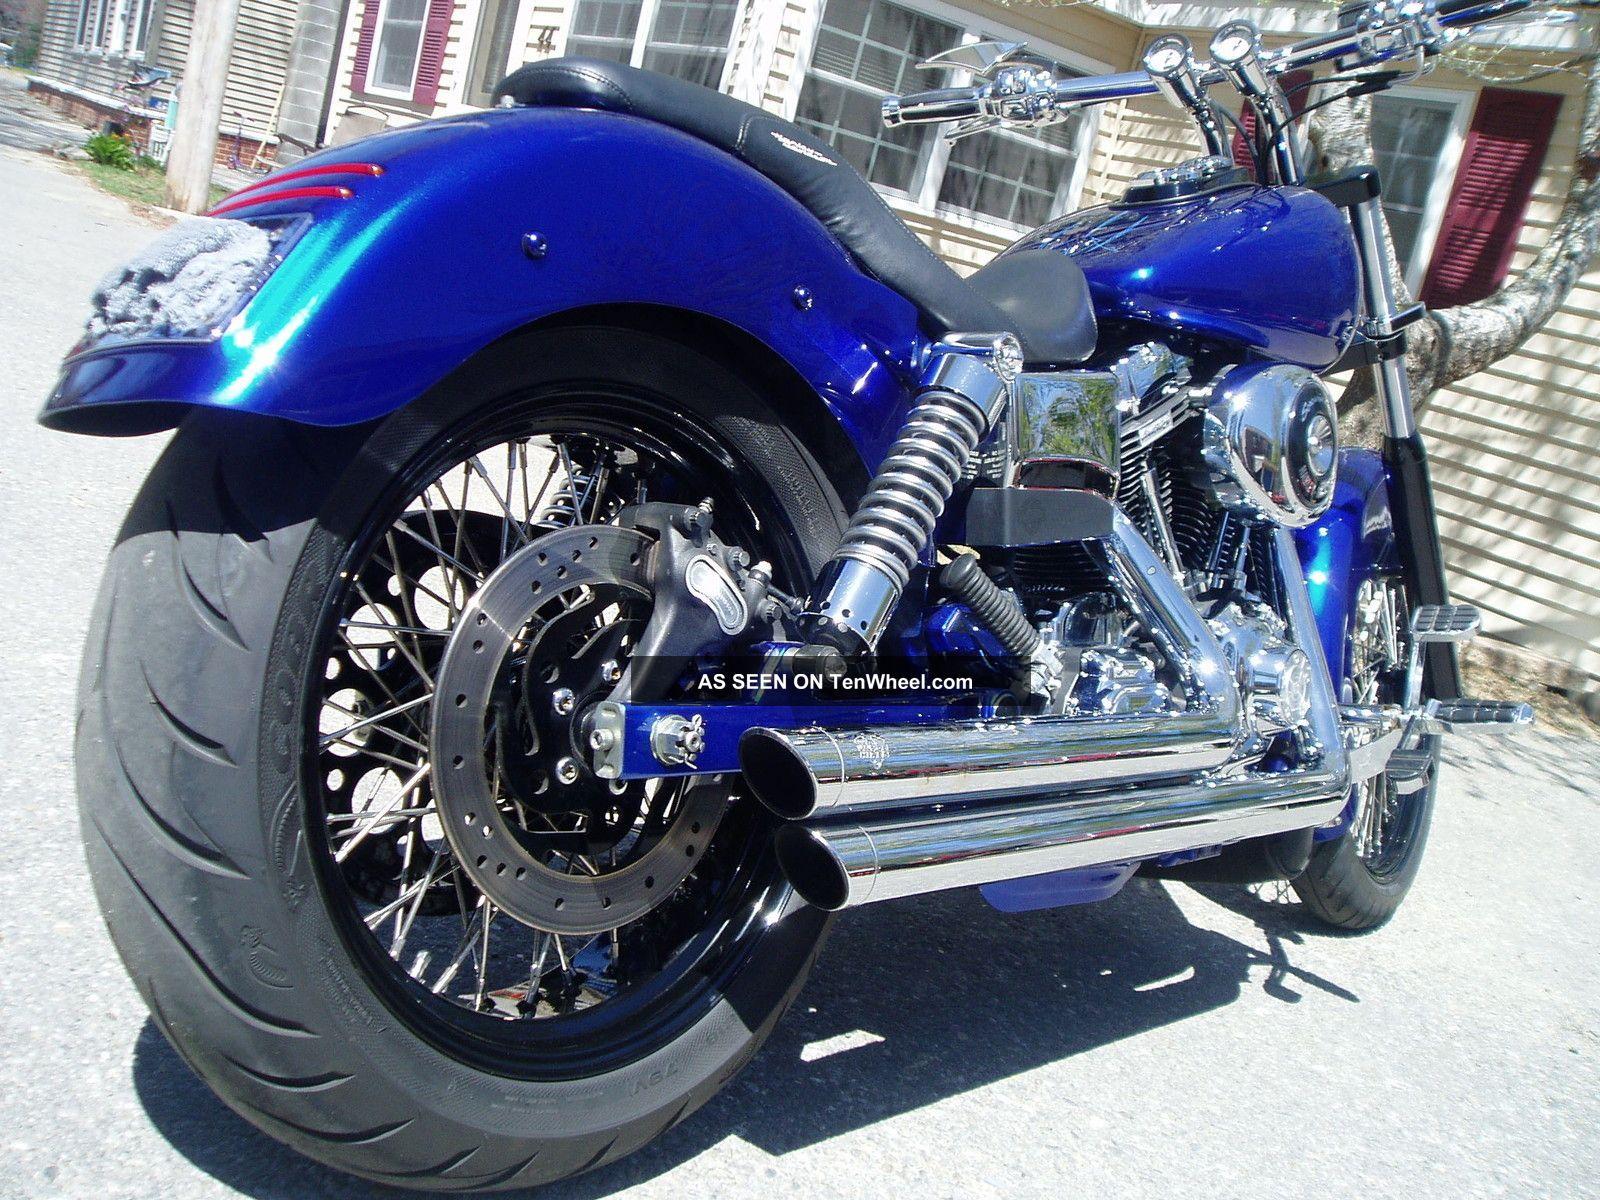 2002 Harley Davidson Fxd Custom Show Bike Dyna photo